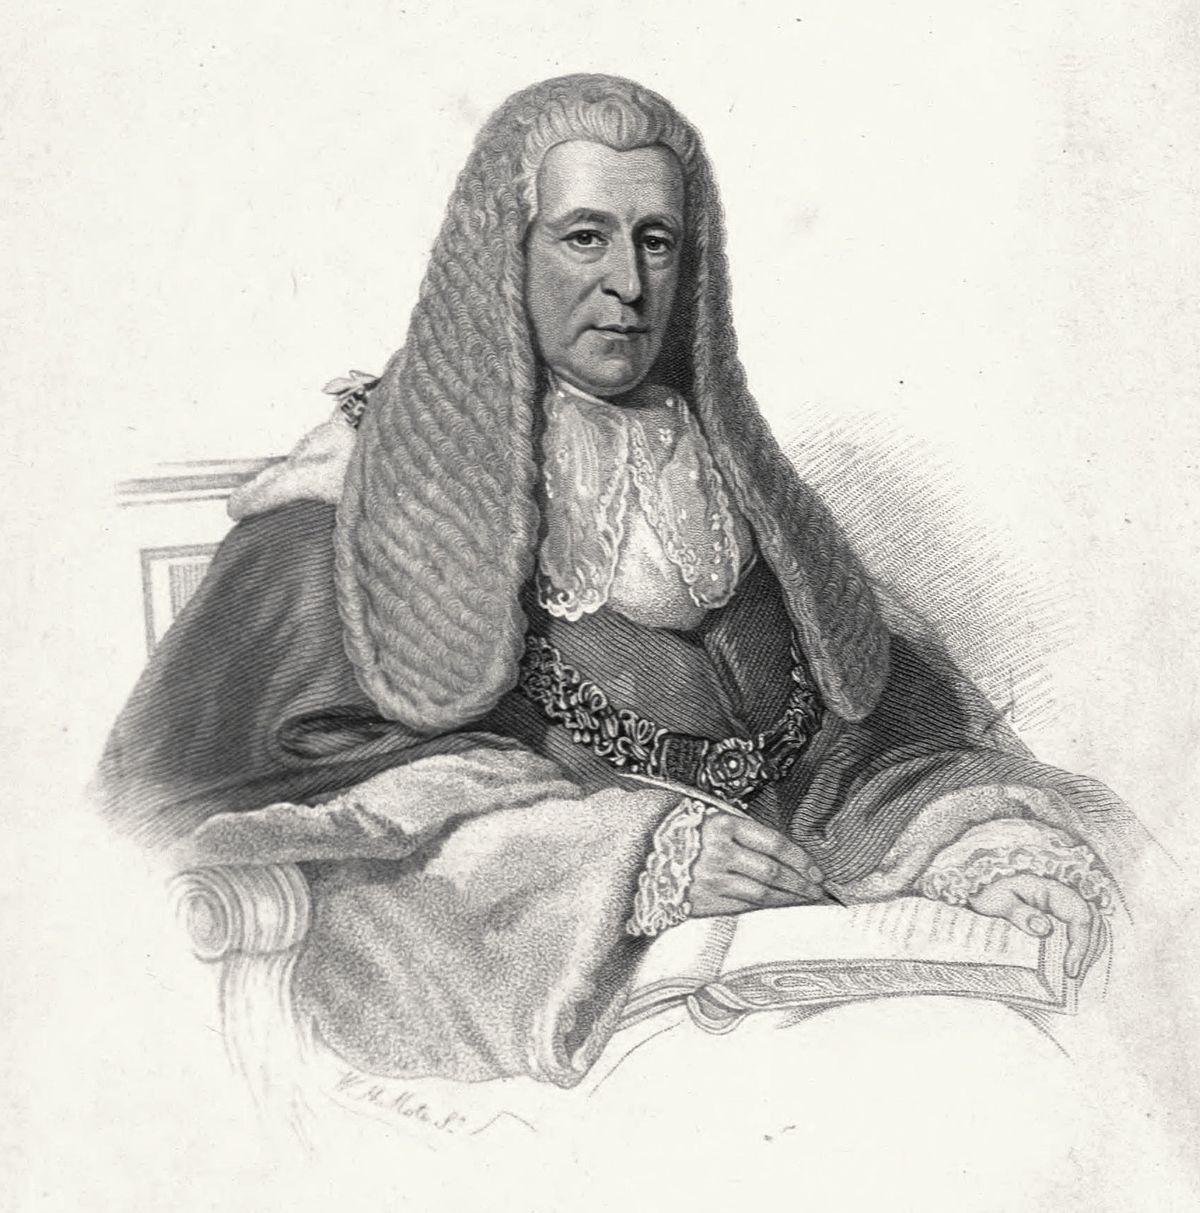 Thomas Langlois Lefroy - Wikipedia